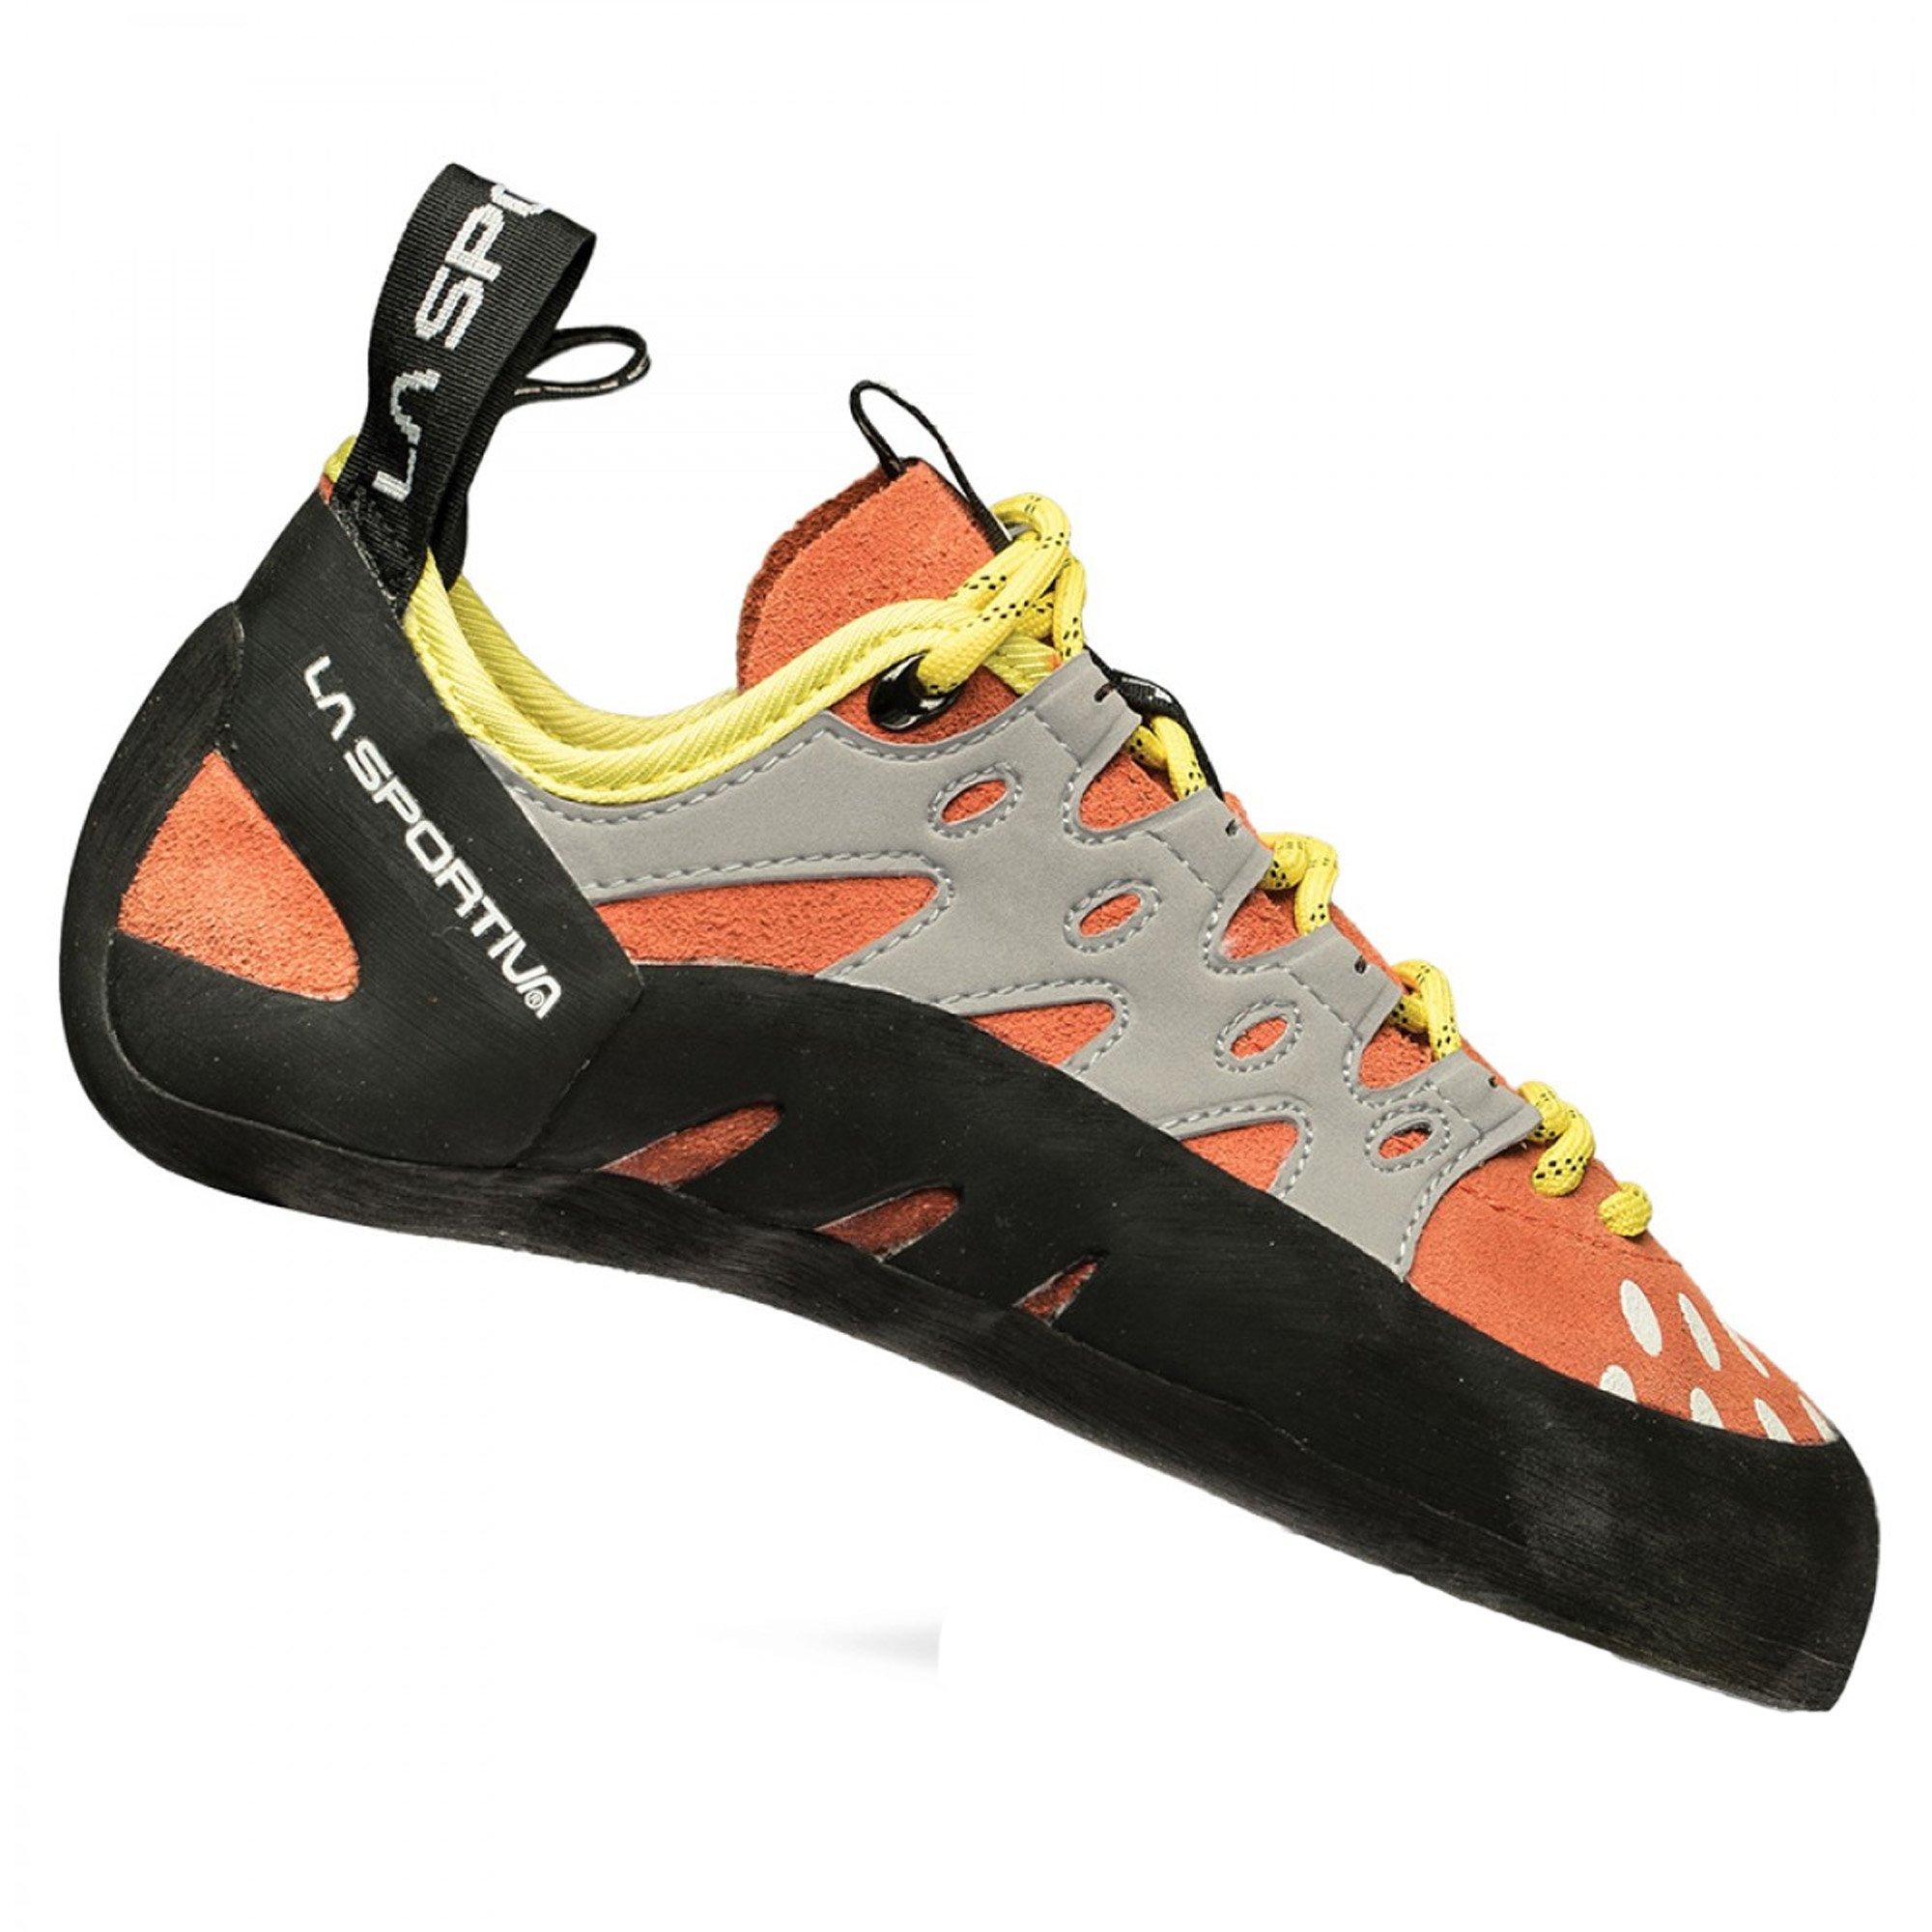 La Sportiva Women's TarantuLace Performance Rock Climbing Shoe, Coral, 39 M EU